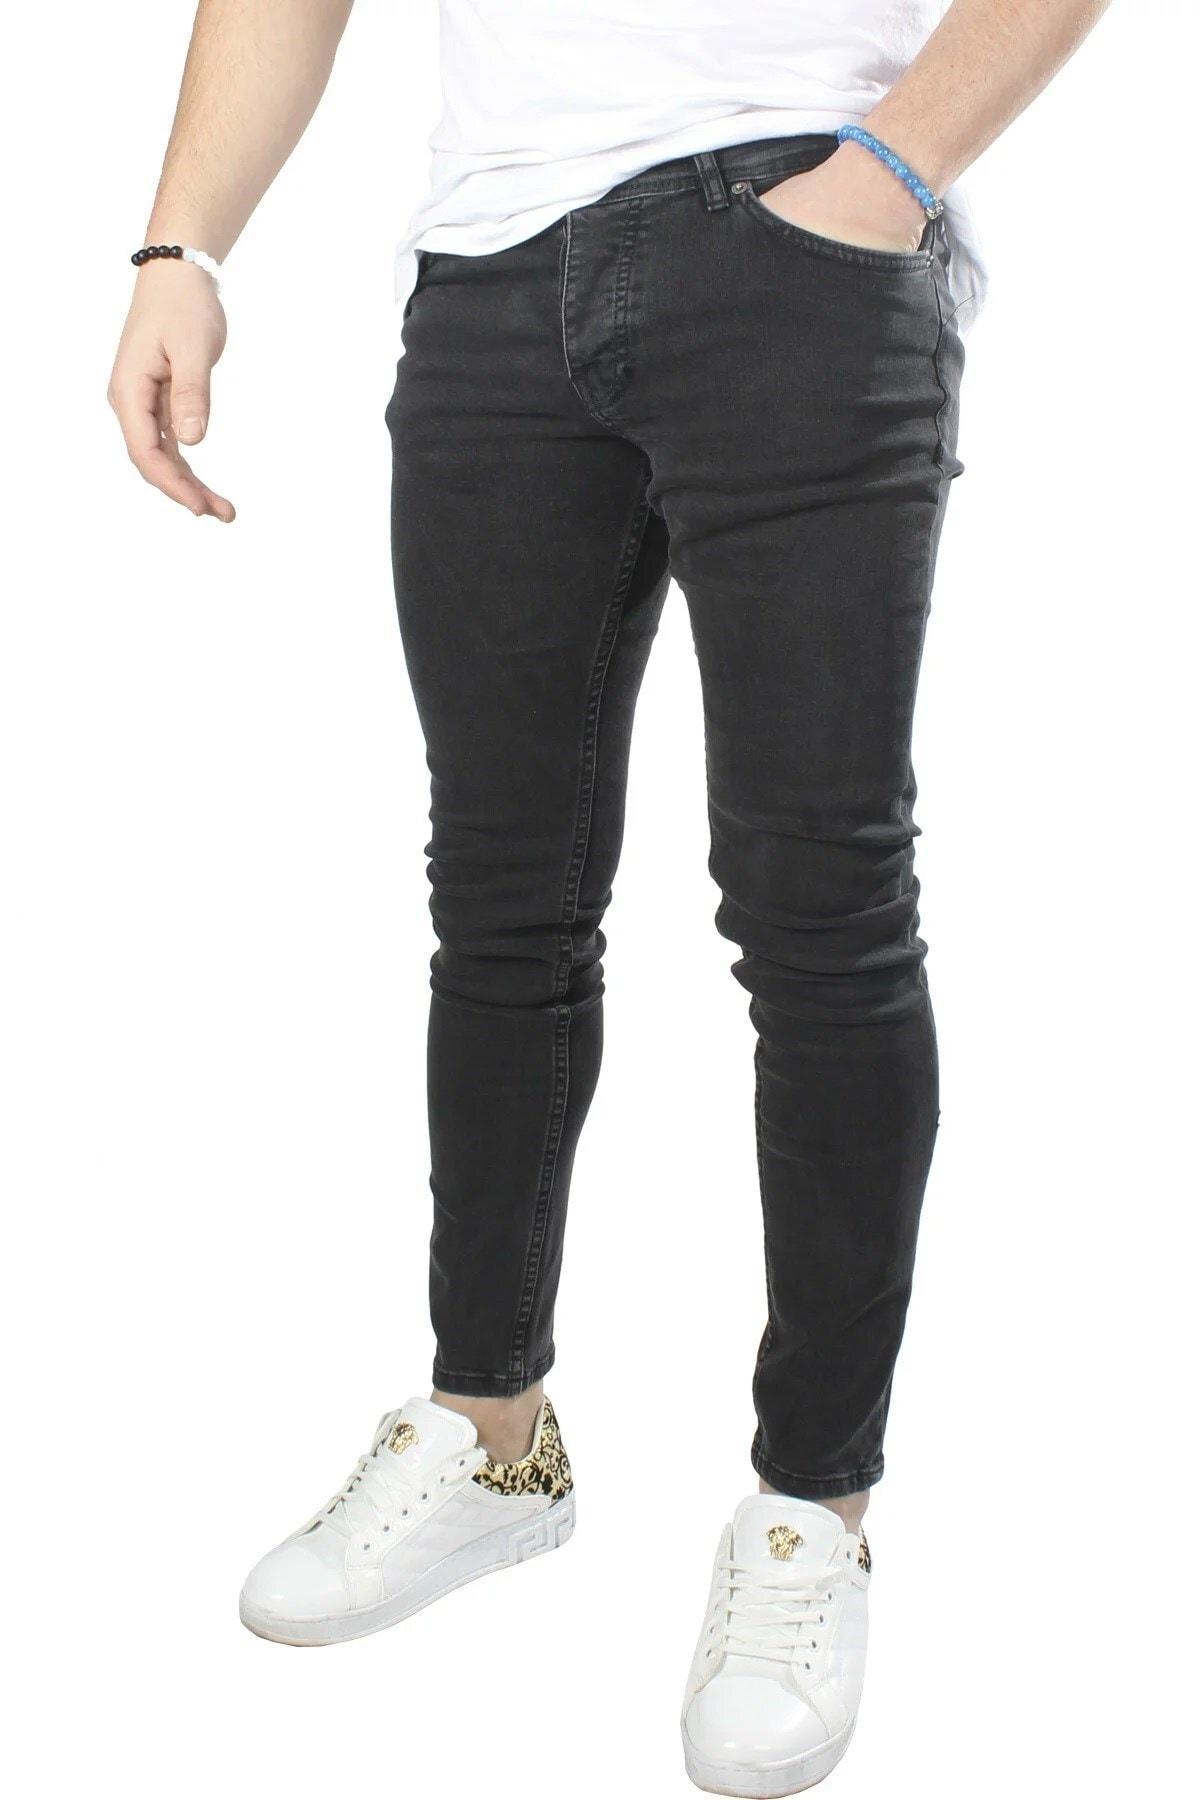 Terapi Men Erkek Kot Pantolon 9K-2100341-007 Füme 0